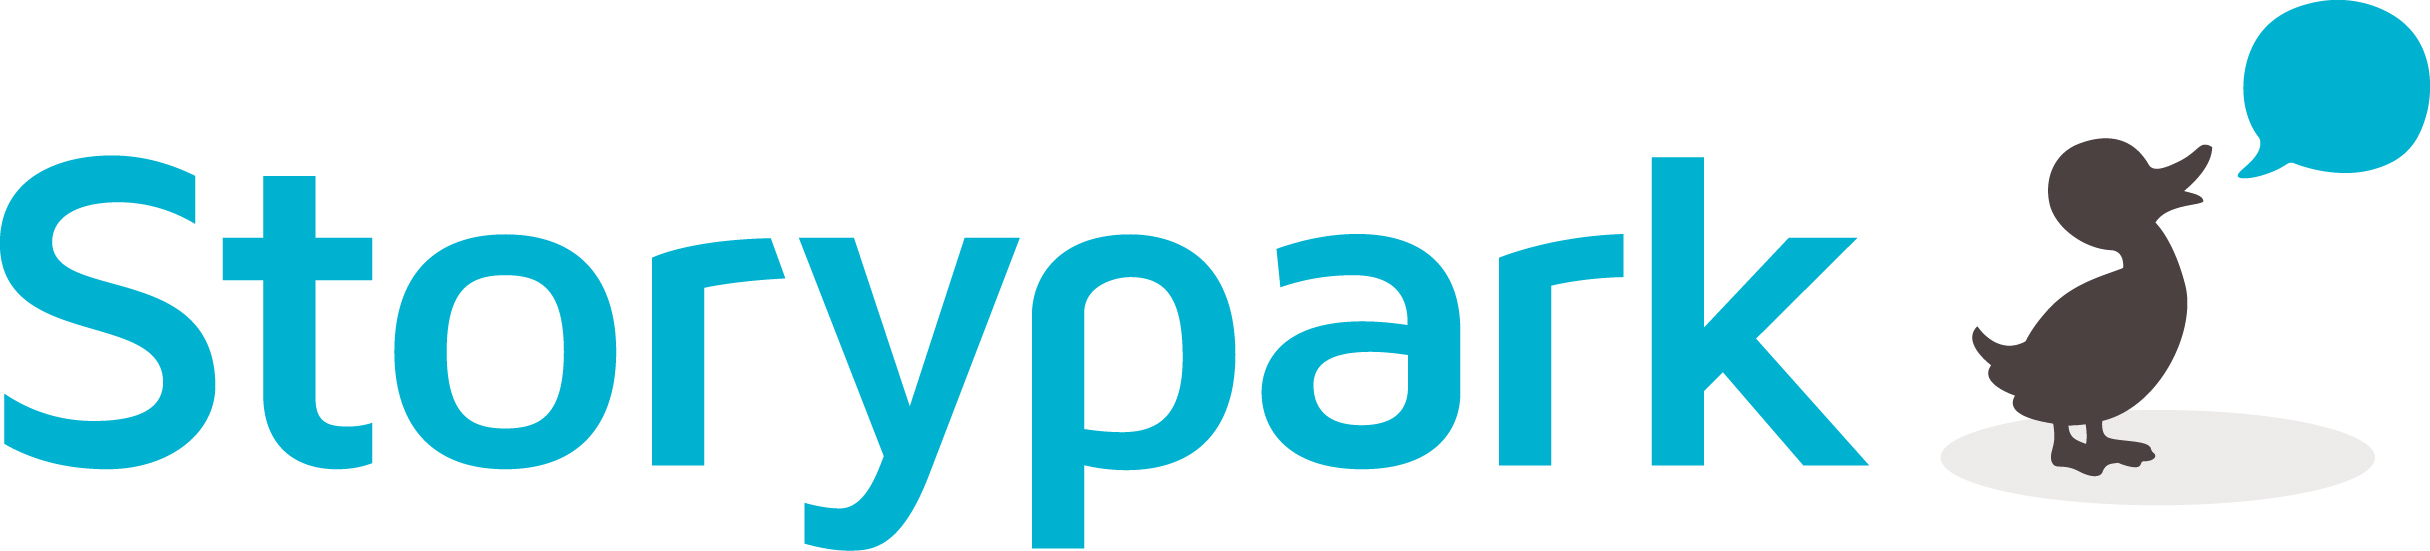 Storypark_logo.jpg